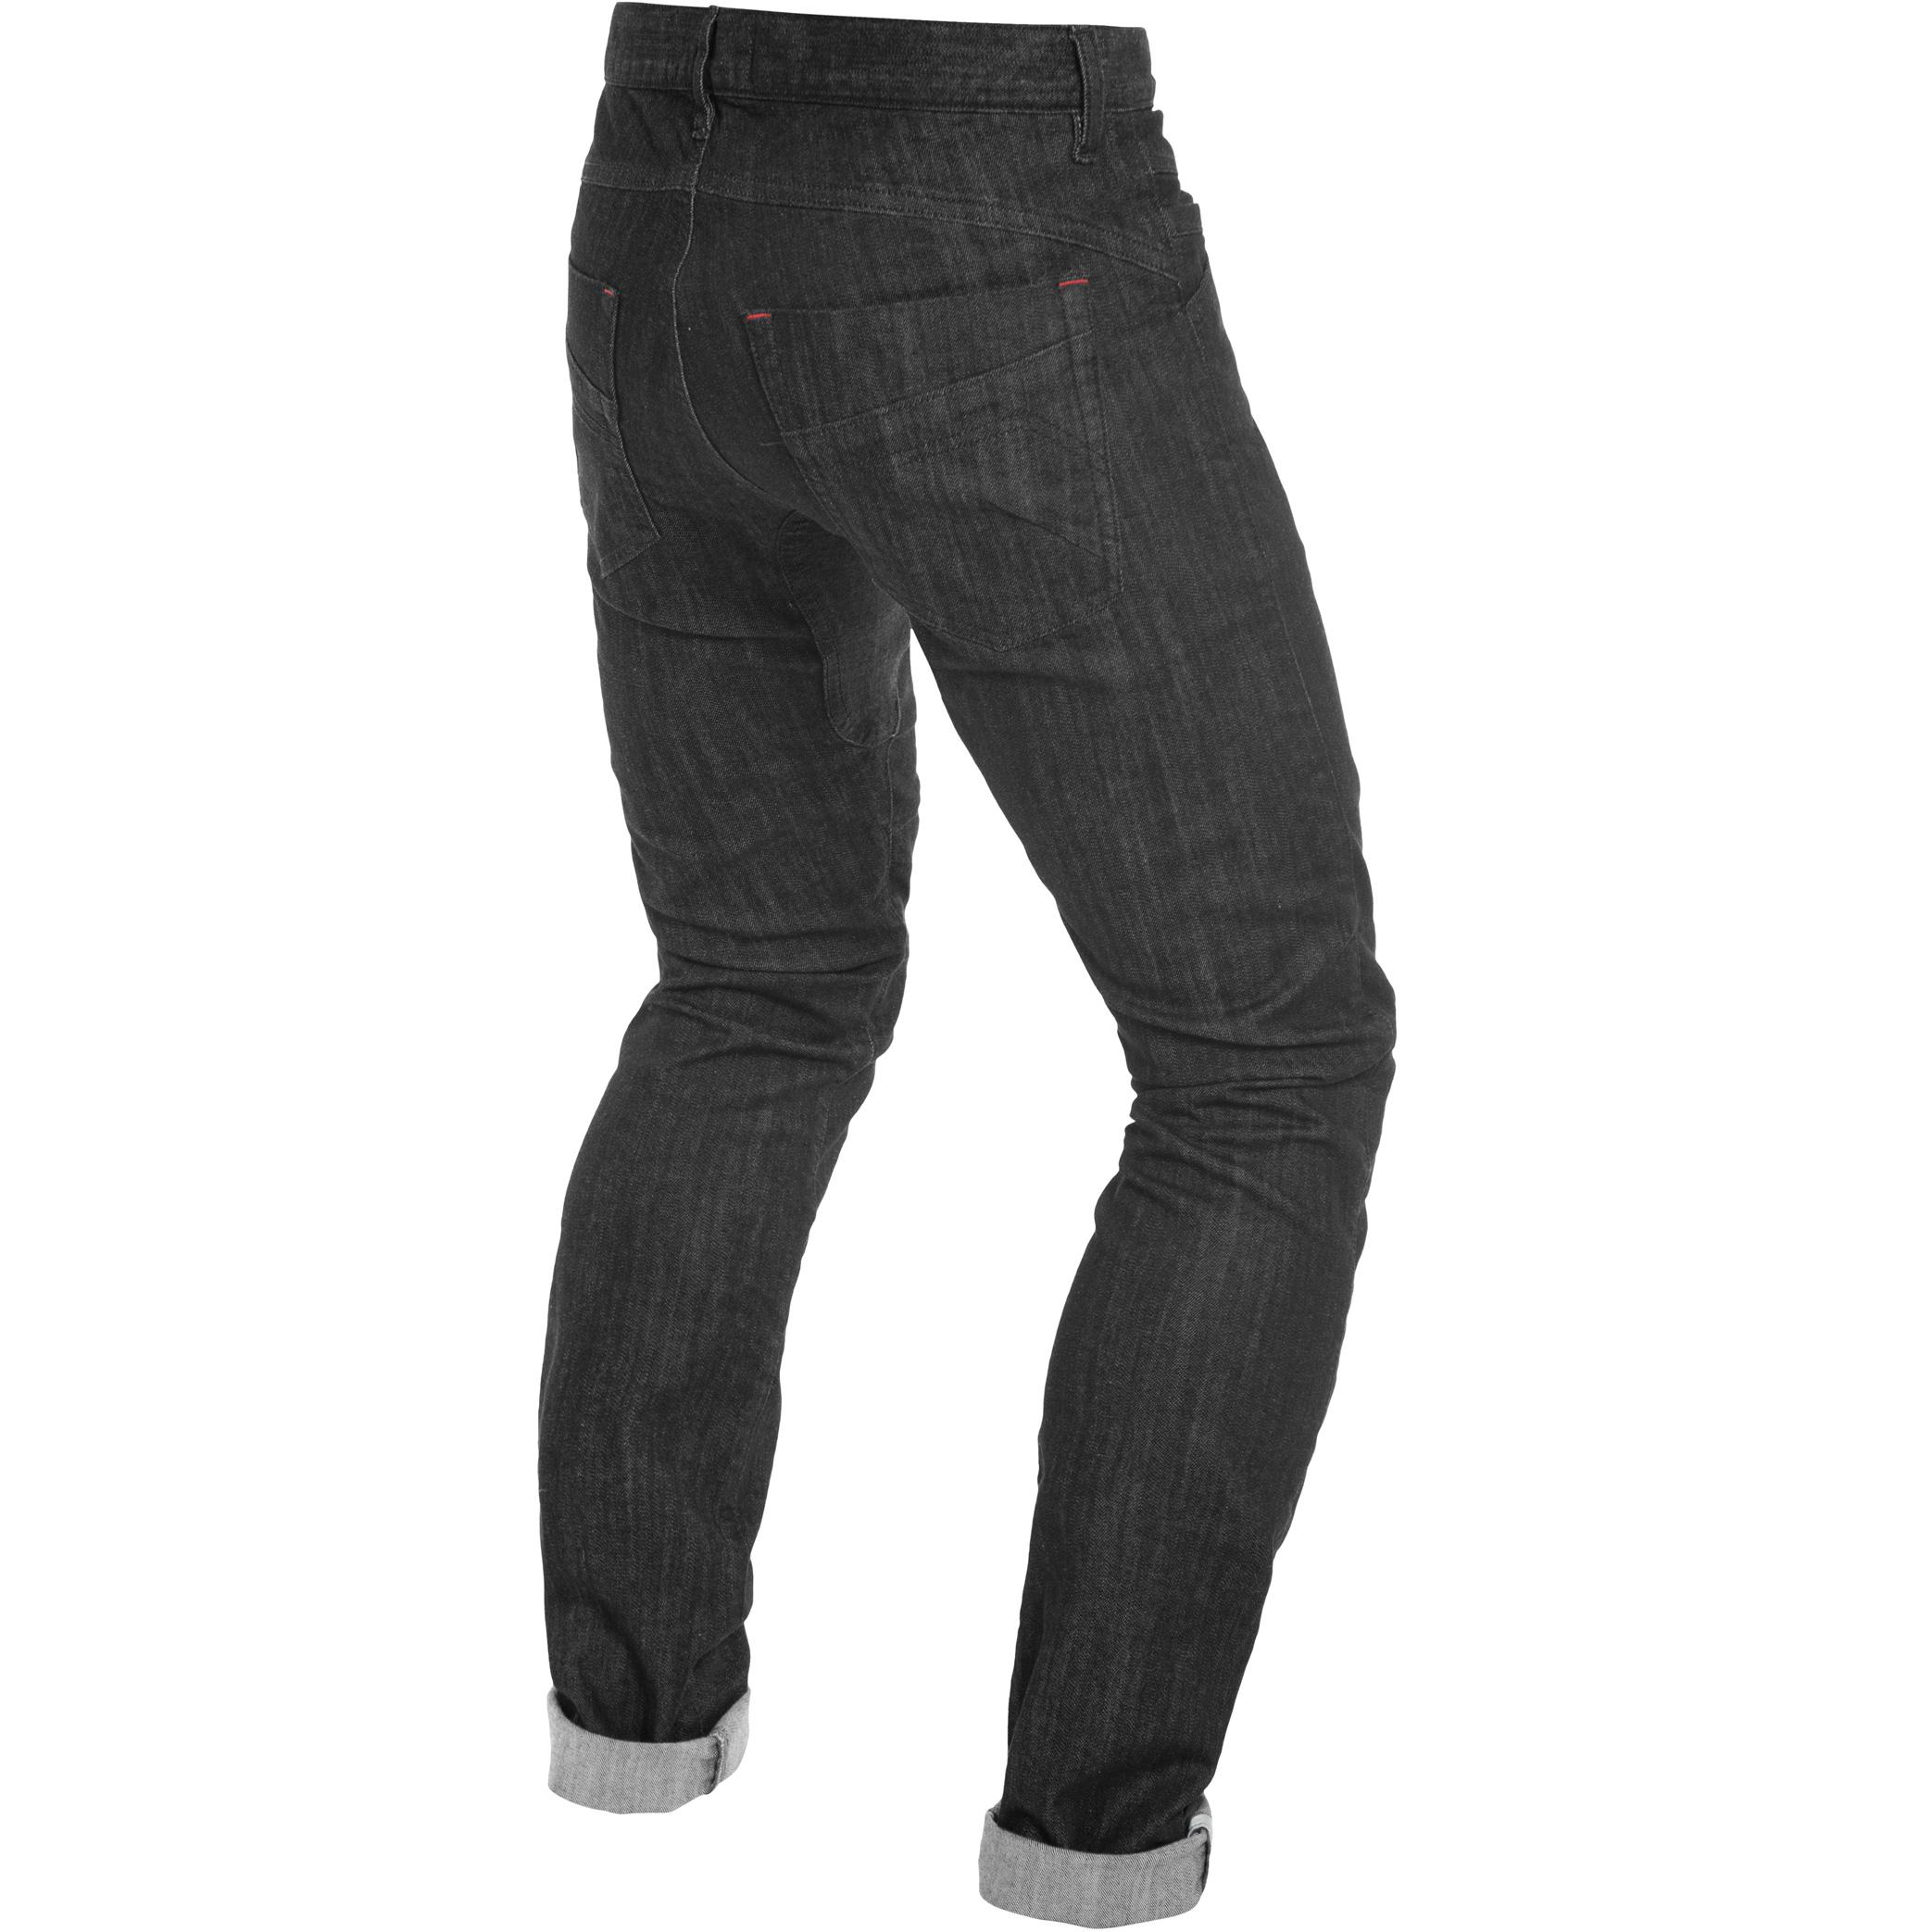 DAINESE-jeans-trento-slim-image-10938929